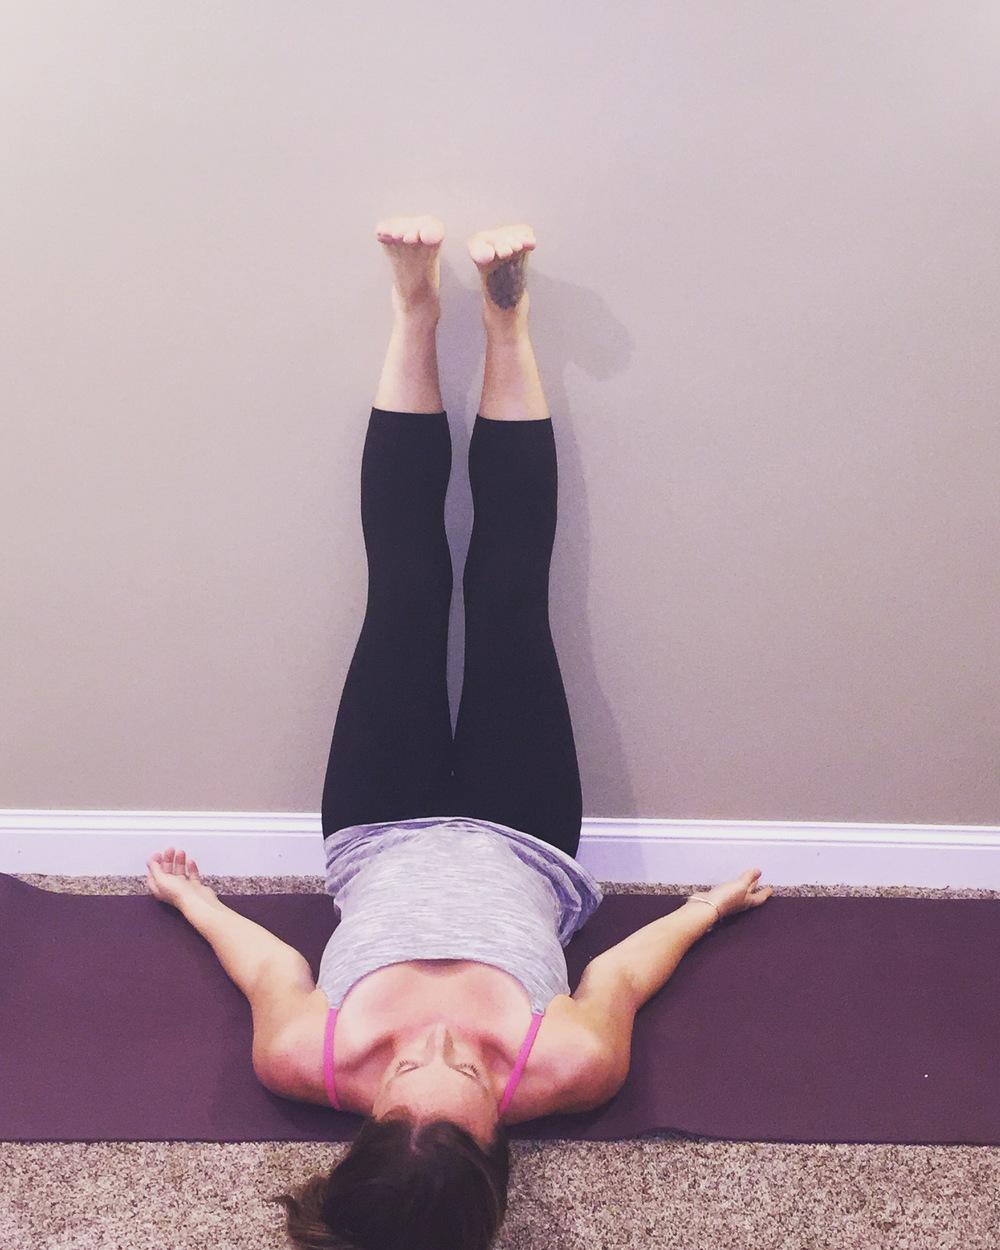 Legs-Up-the-Wall Pose   Viparita Karani